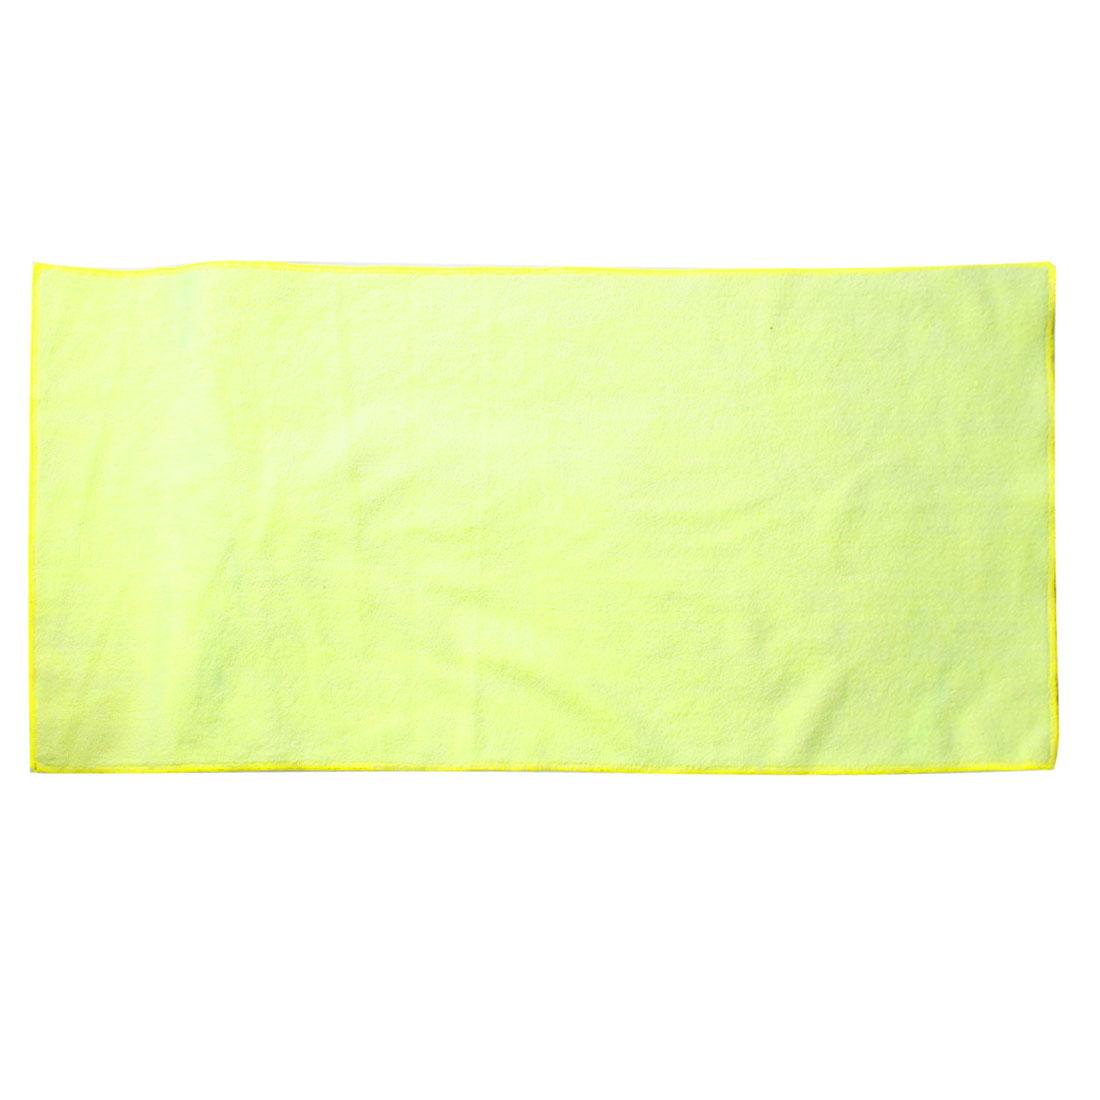 32cm x 63cm Yellow Face Hand Bath Washcloth Hair Dryer Towel for Families Hotel